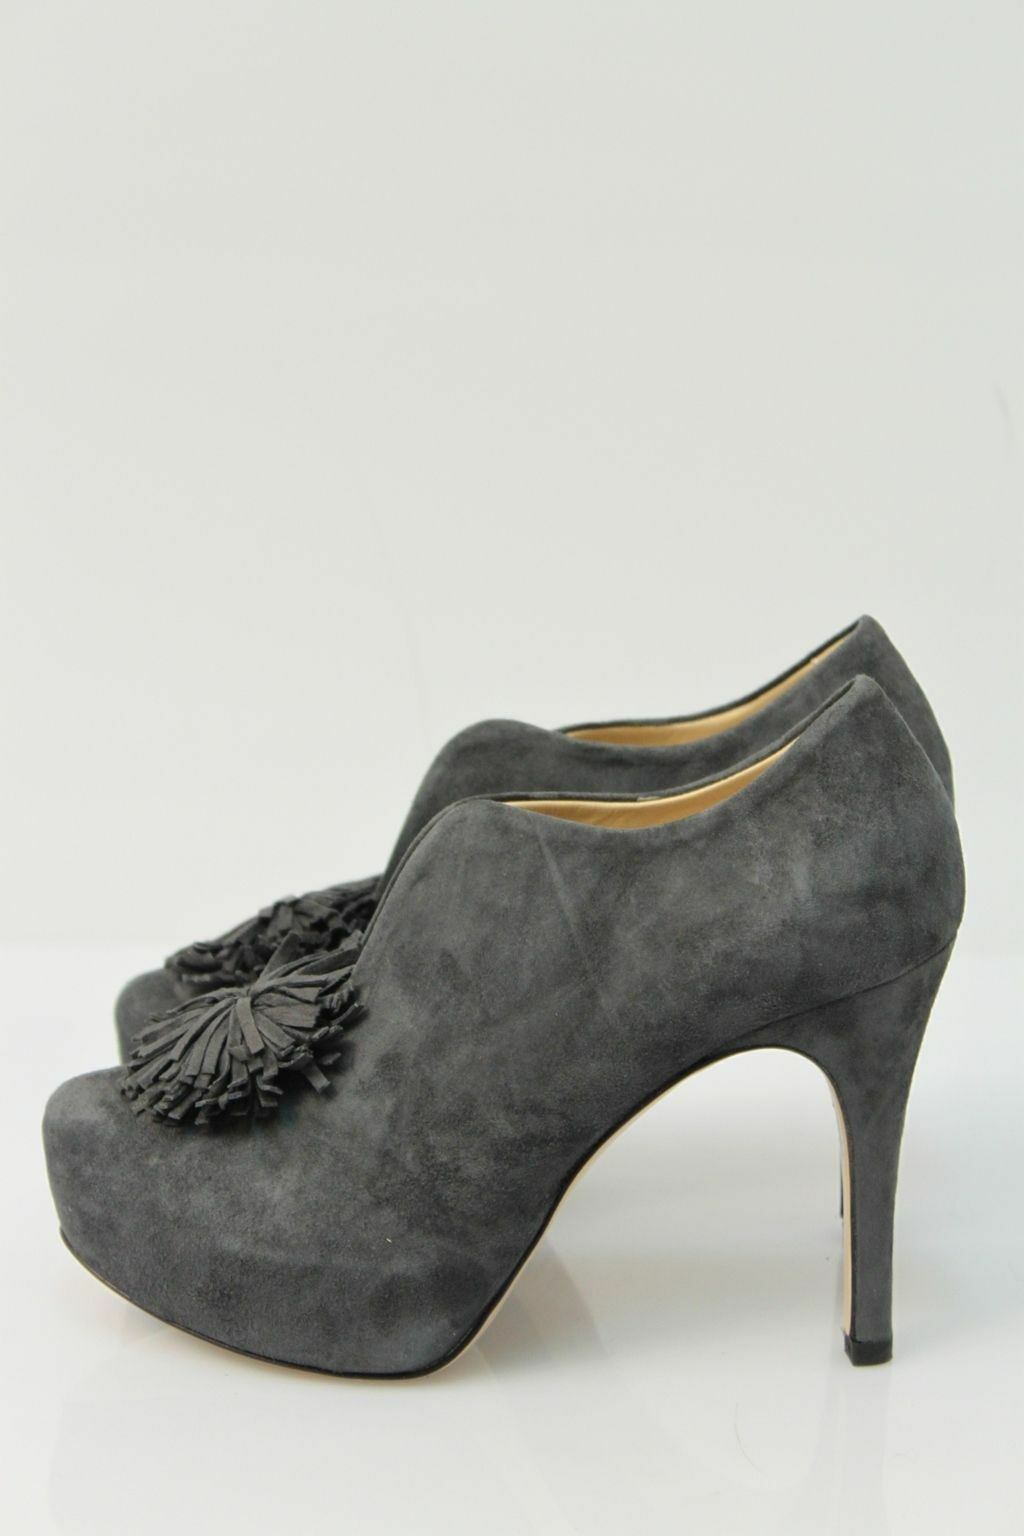 chaussures  - 50% TWIN SET femmes ТУФЛИ CPA3B4 gris AA dp